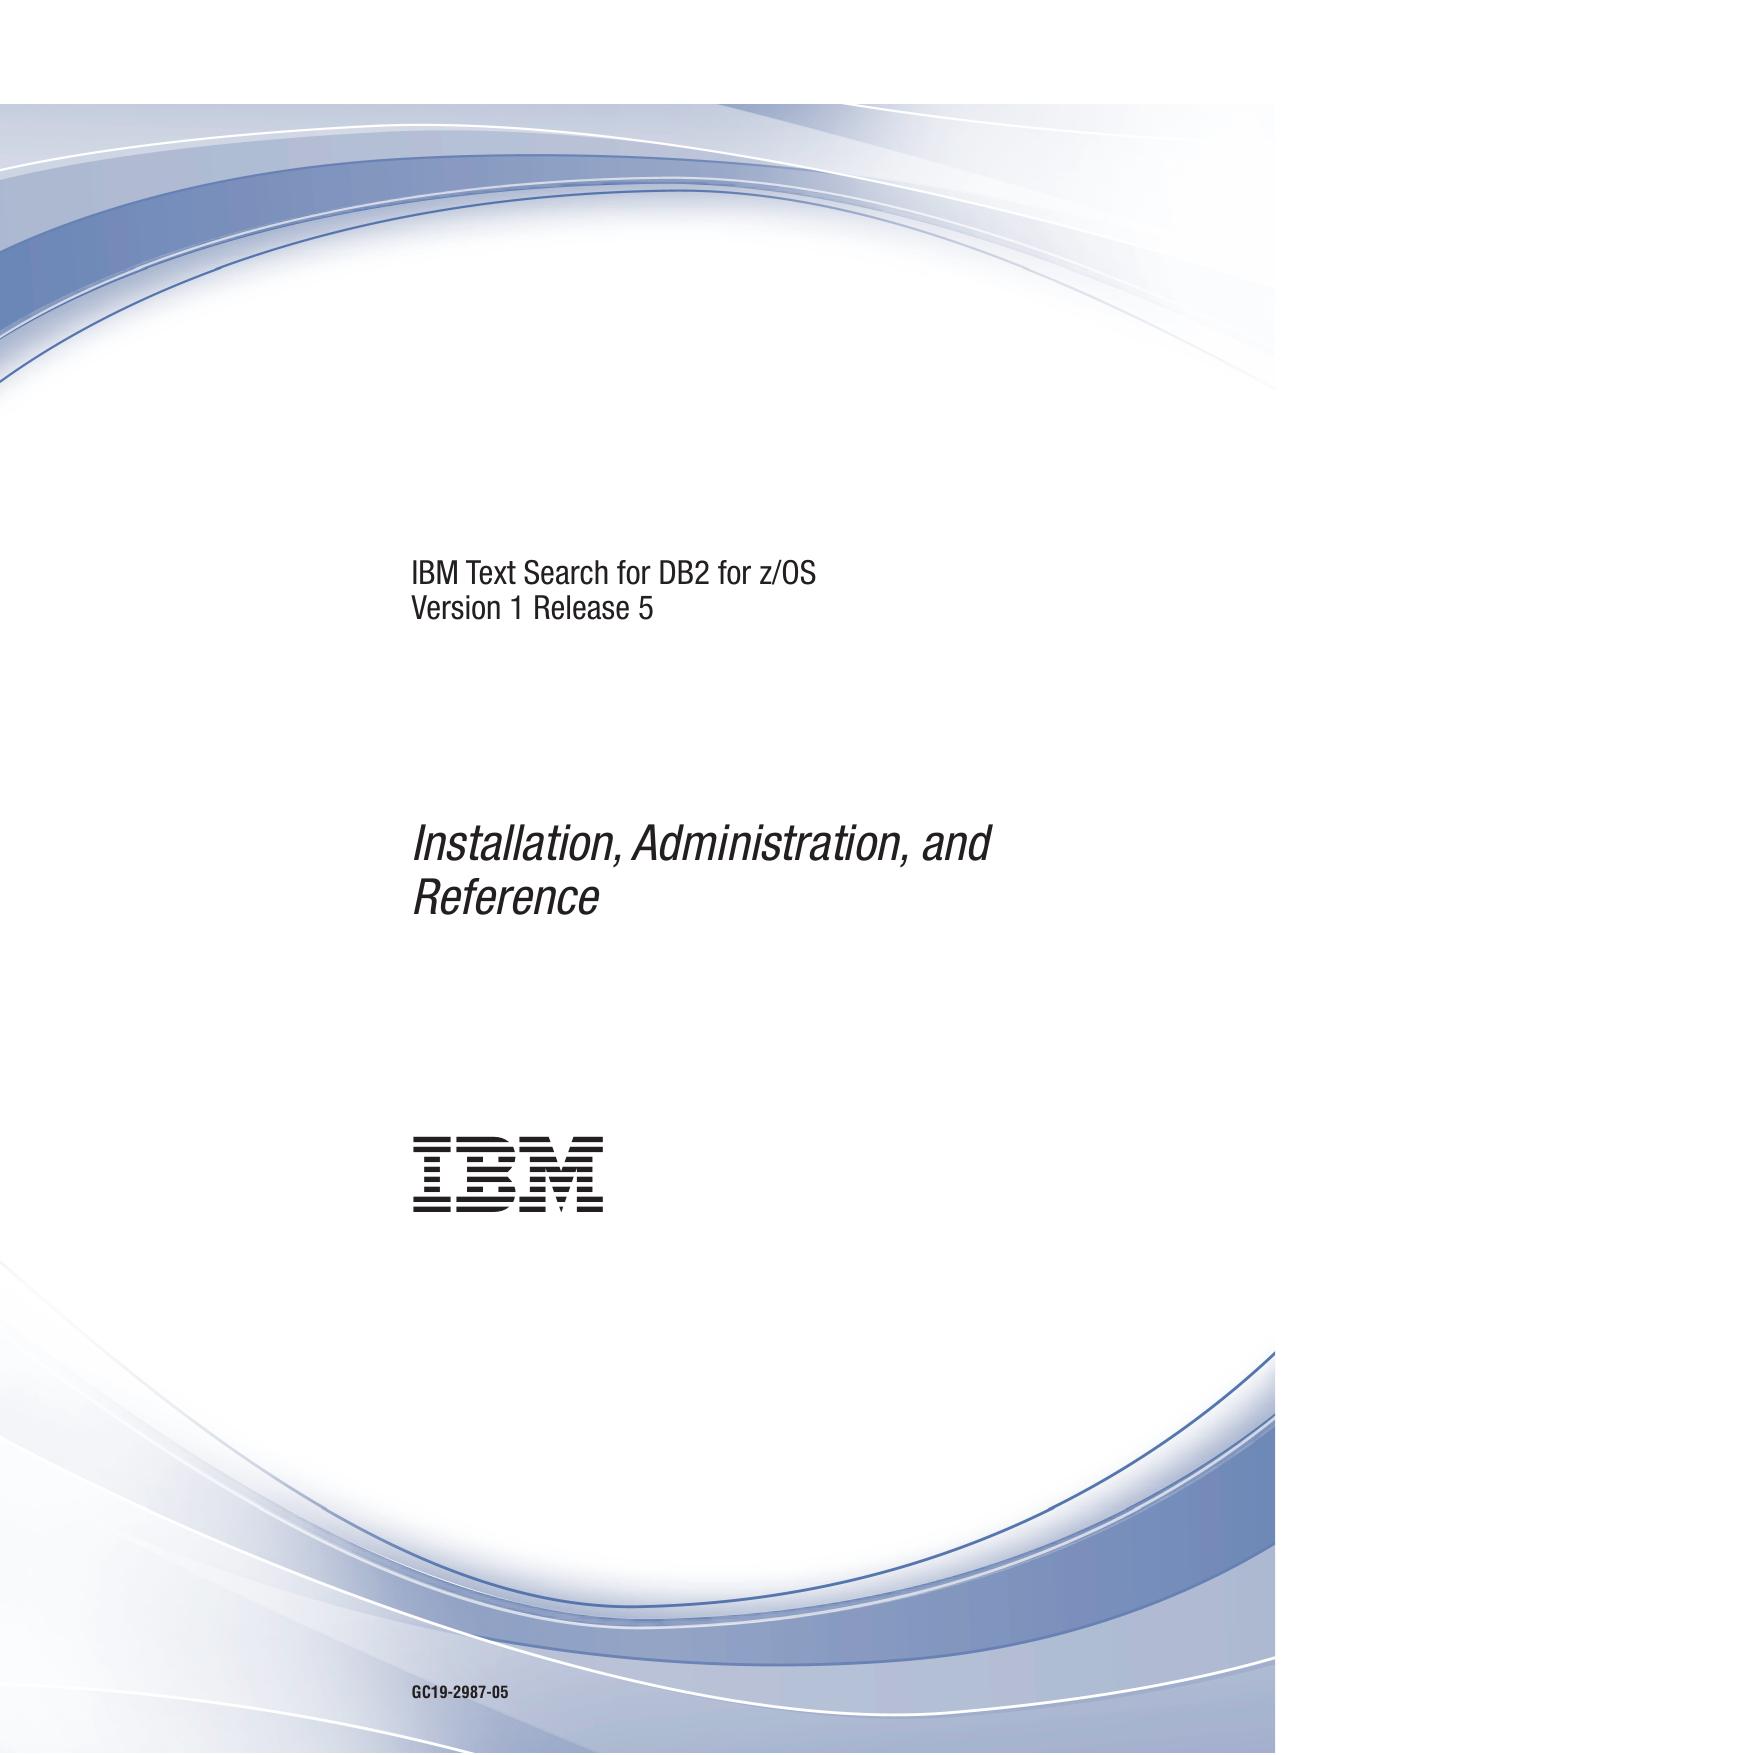 IBM DB2 v10 for z/OS Installation, Administration, and Reference |  manualzz.com